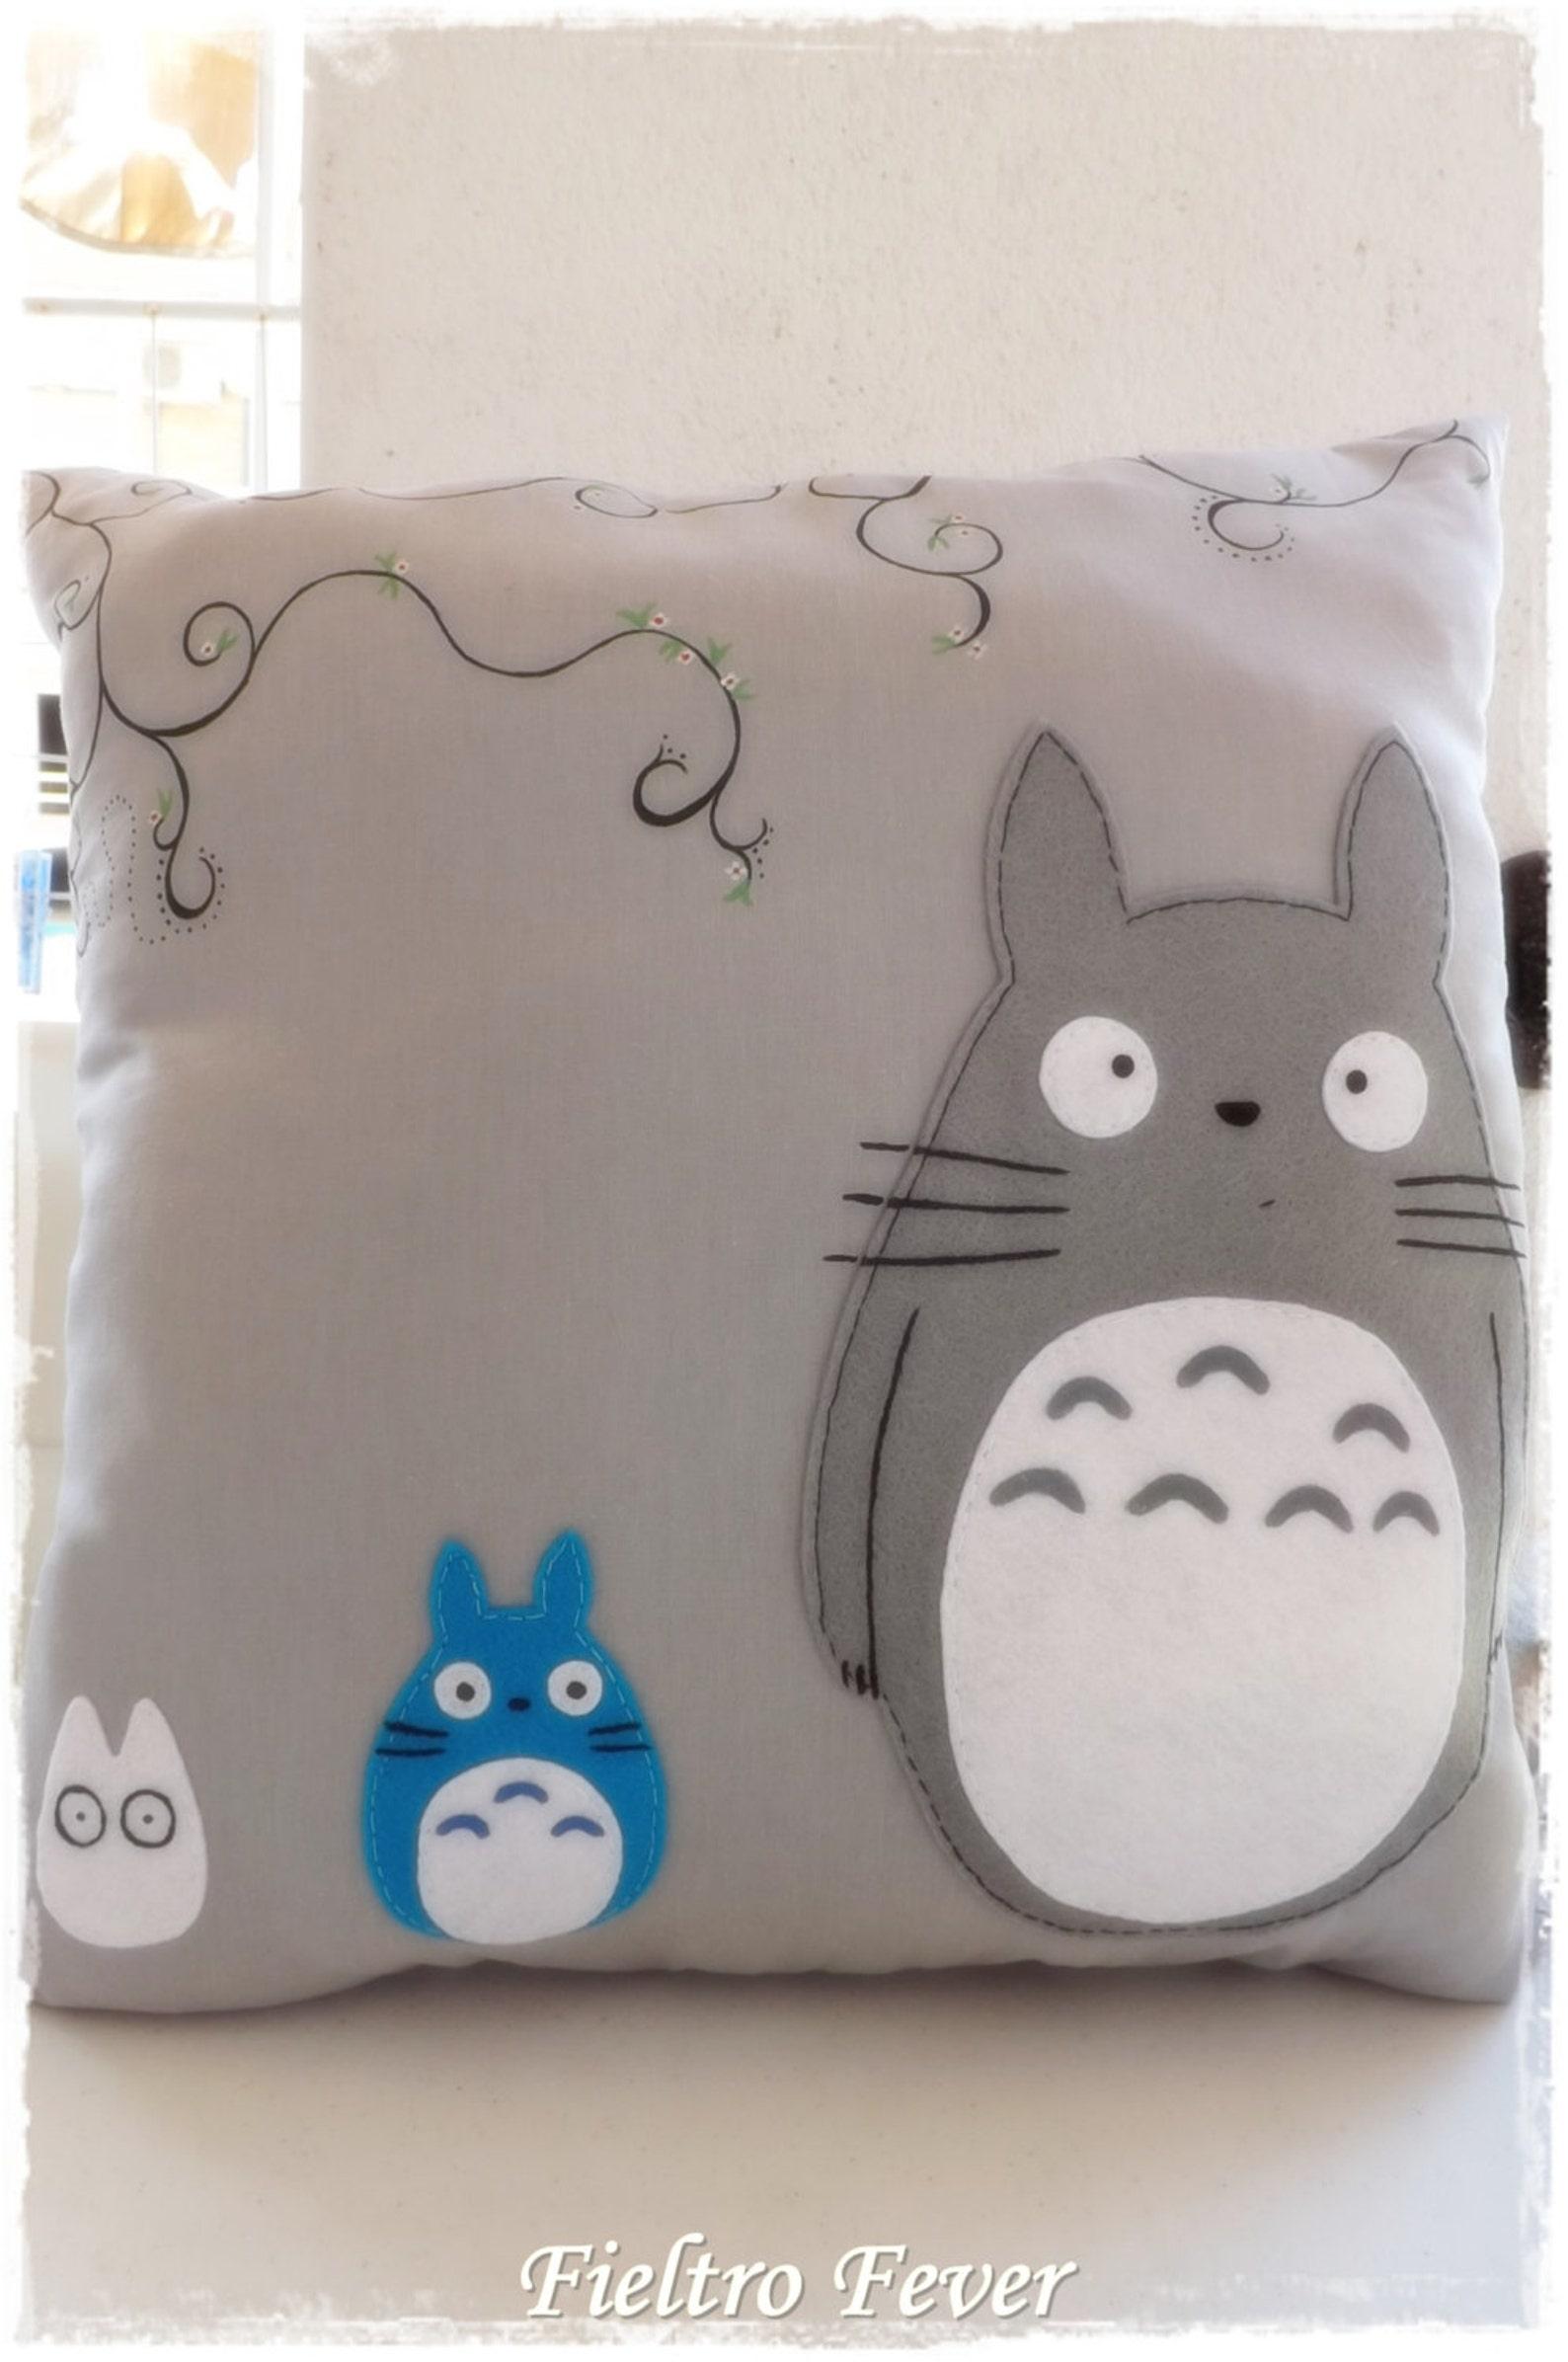 Totoro, Totoro Cushion, Totoro pillow, mi neighbour totoro cushion, totoro purple cushion, hand painted cushion